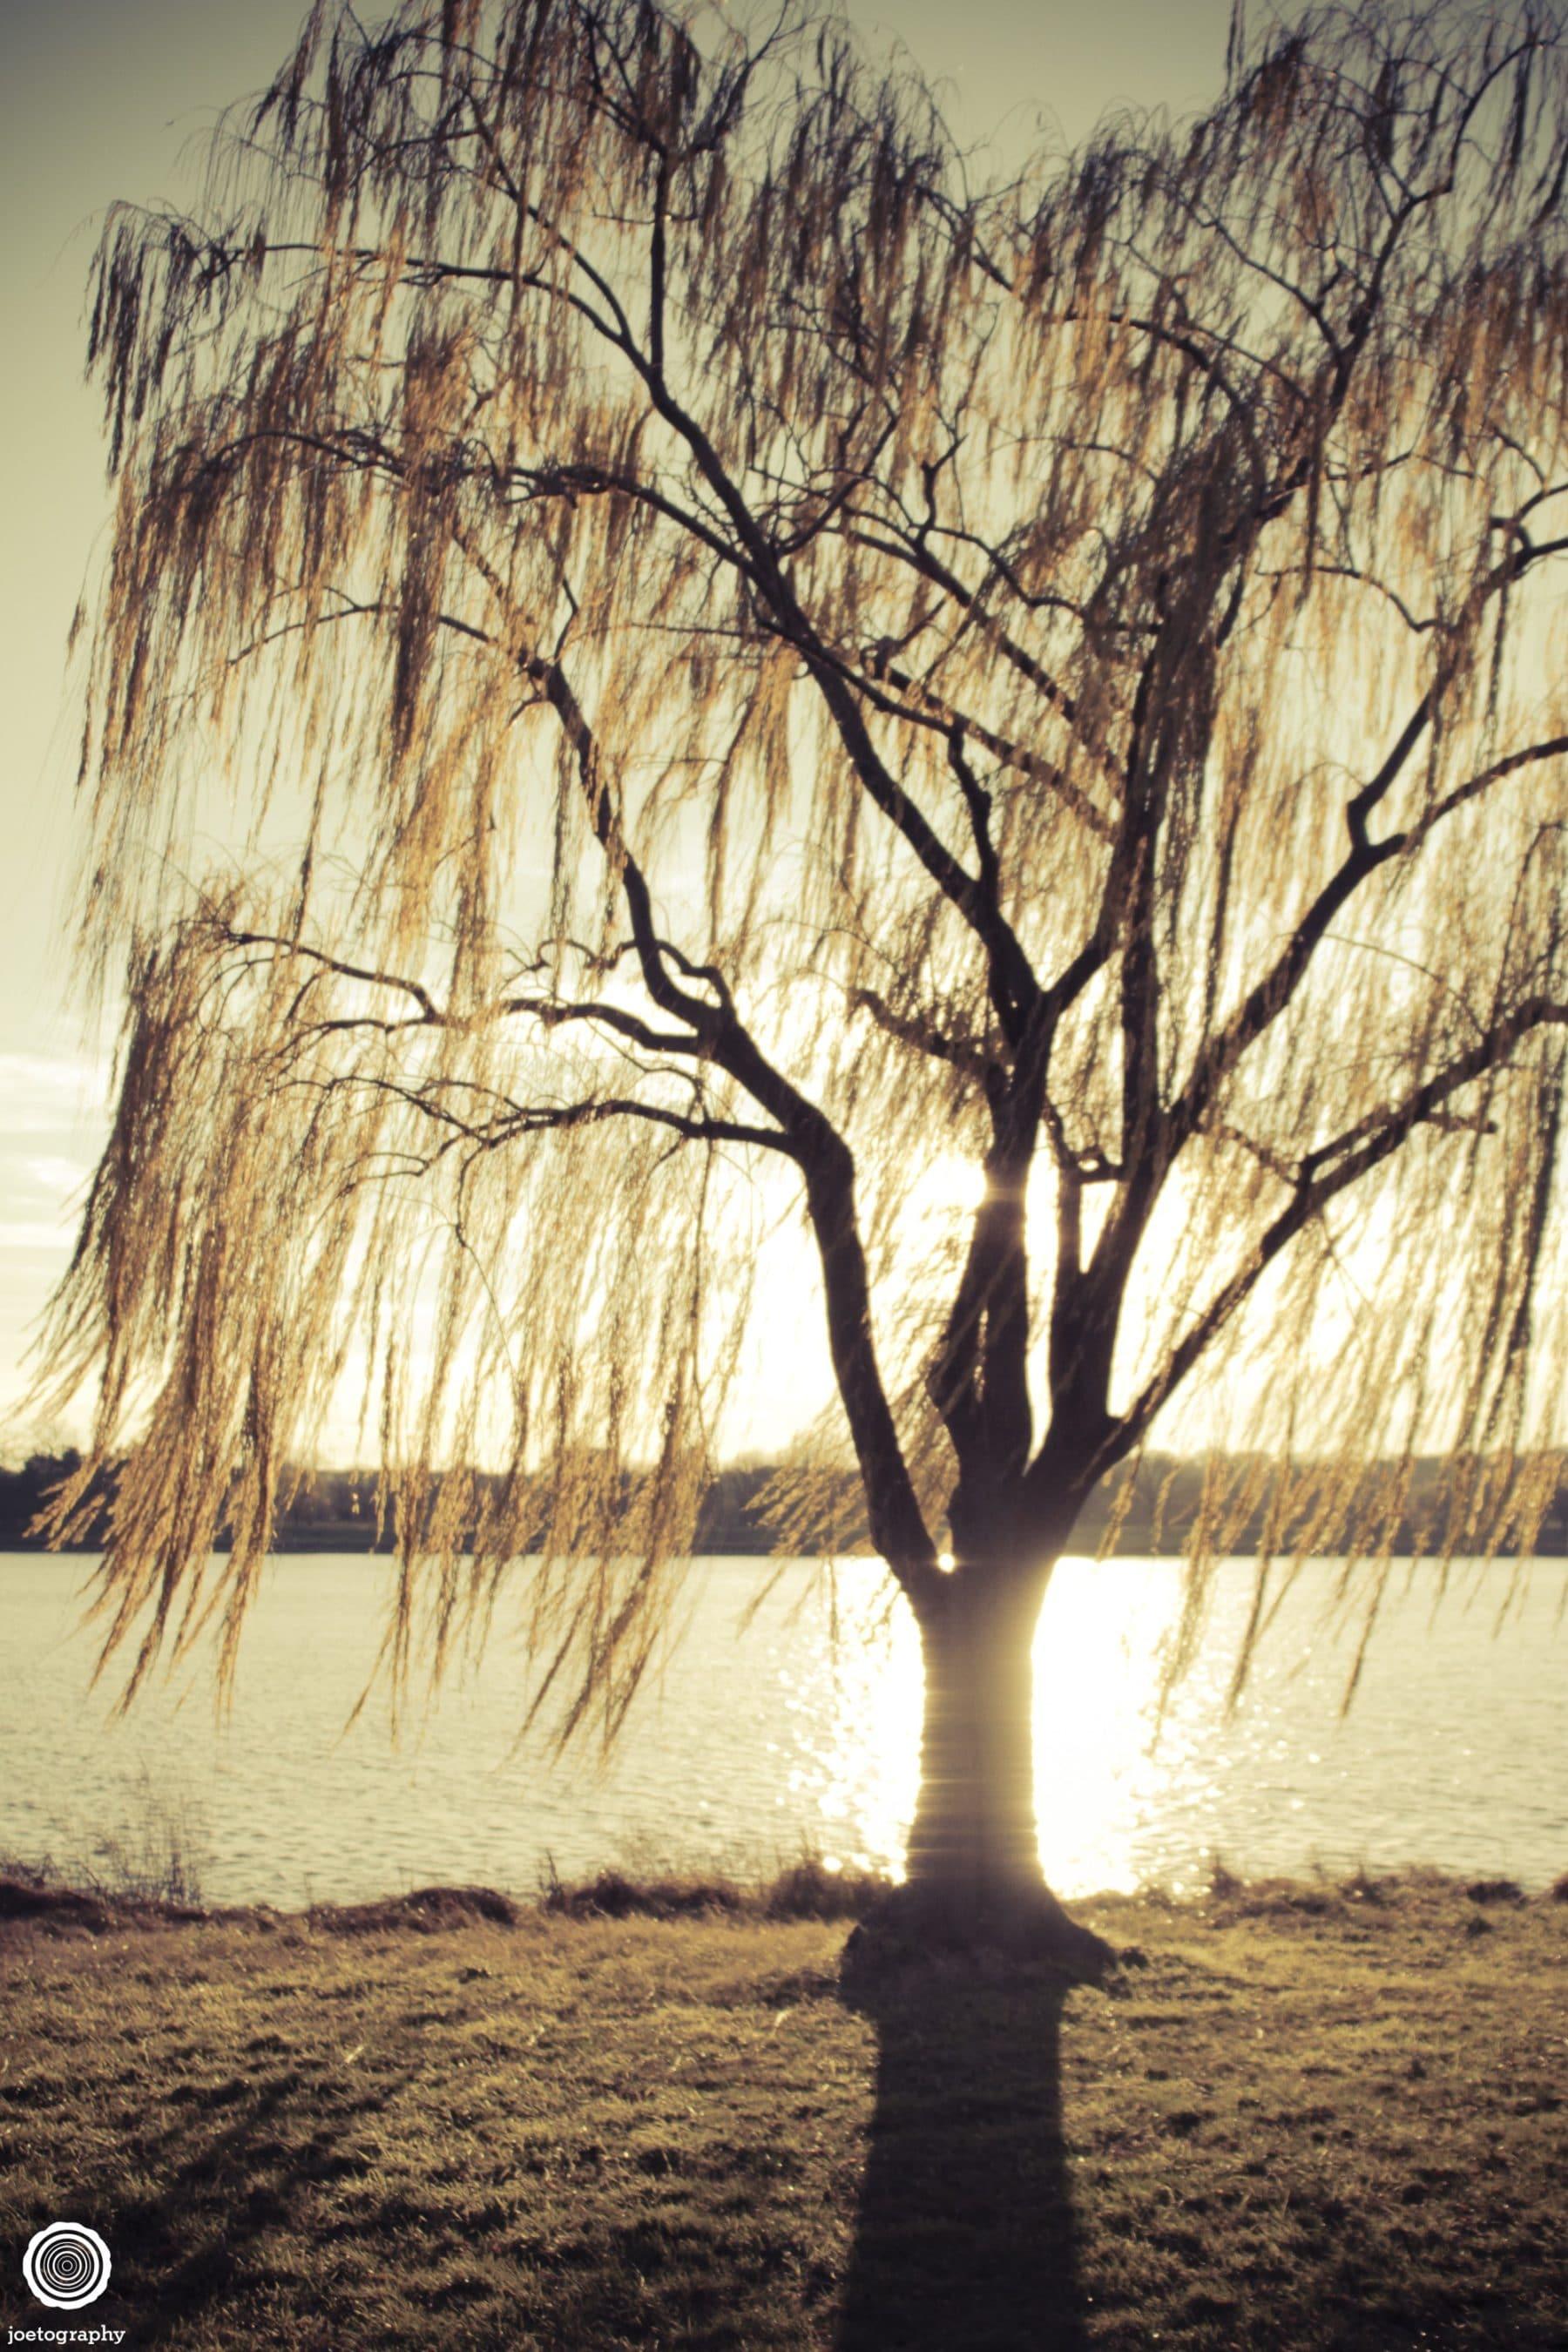 weeping-willow-nature-photography-washington-dc-1